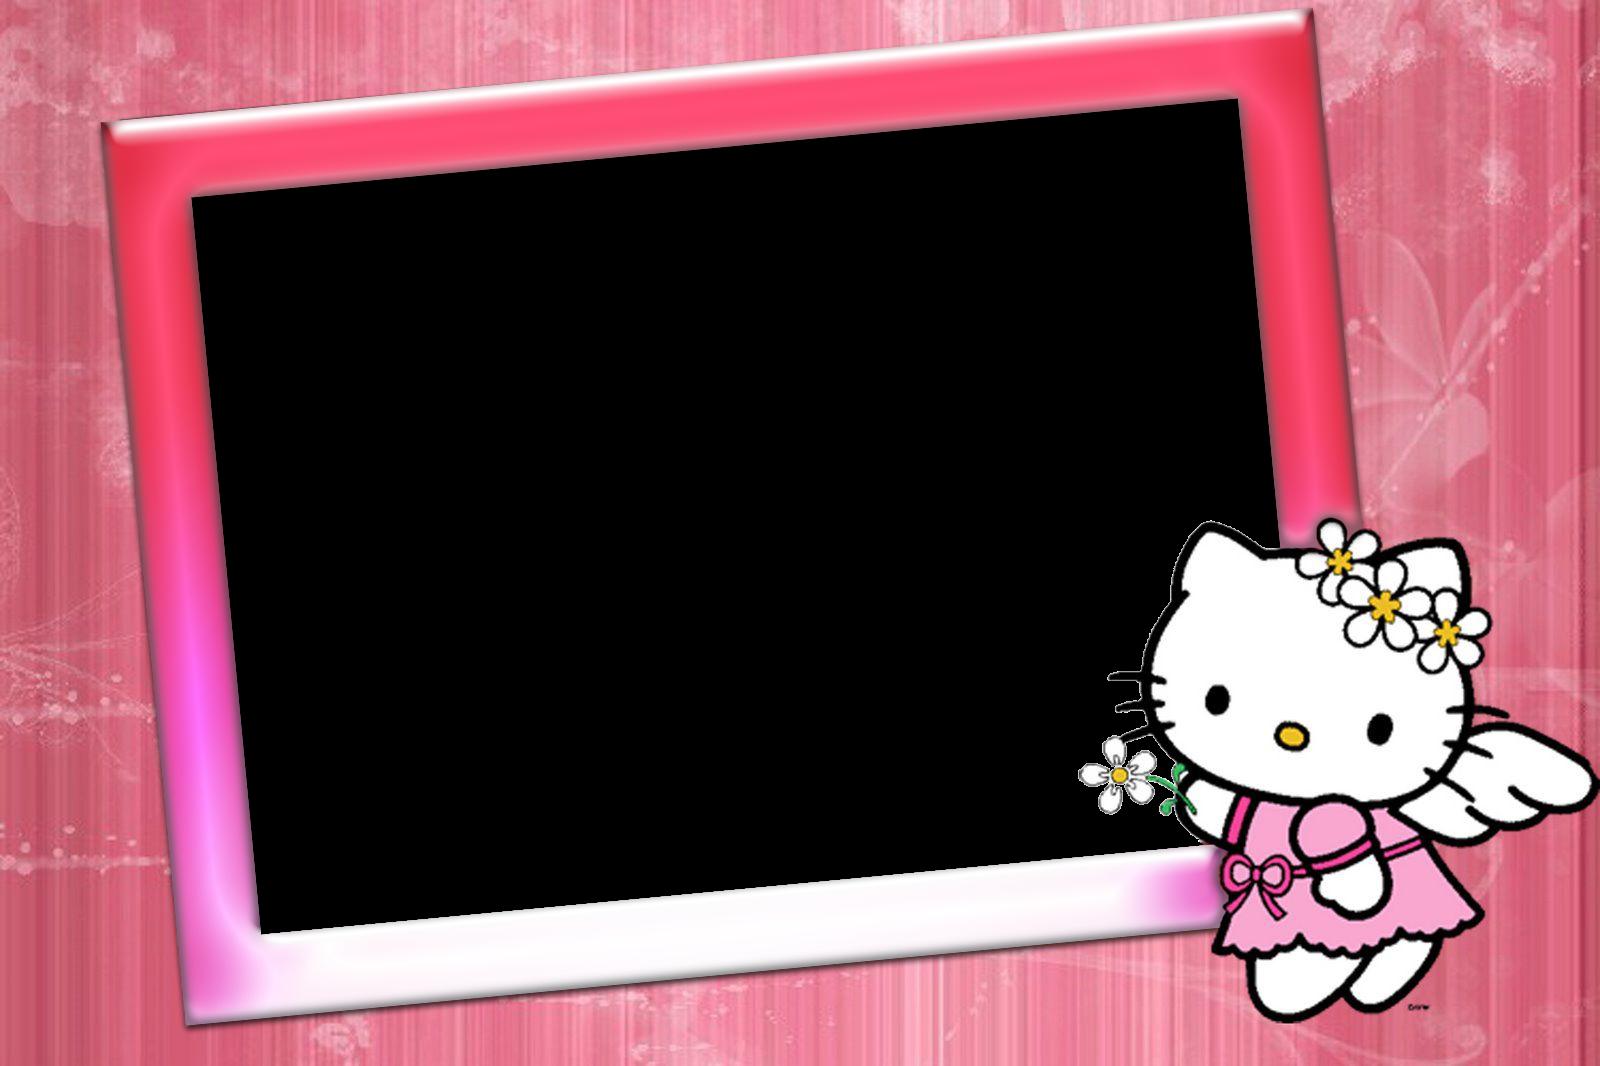 ... para fotos de Hello Kitty. No olvides que tenemos plantillas para